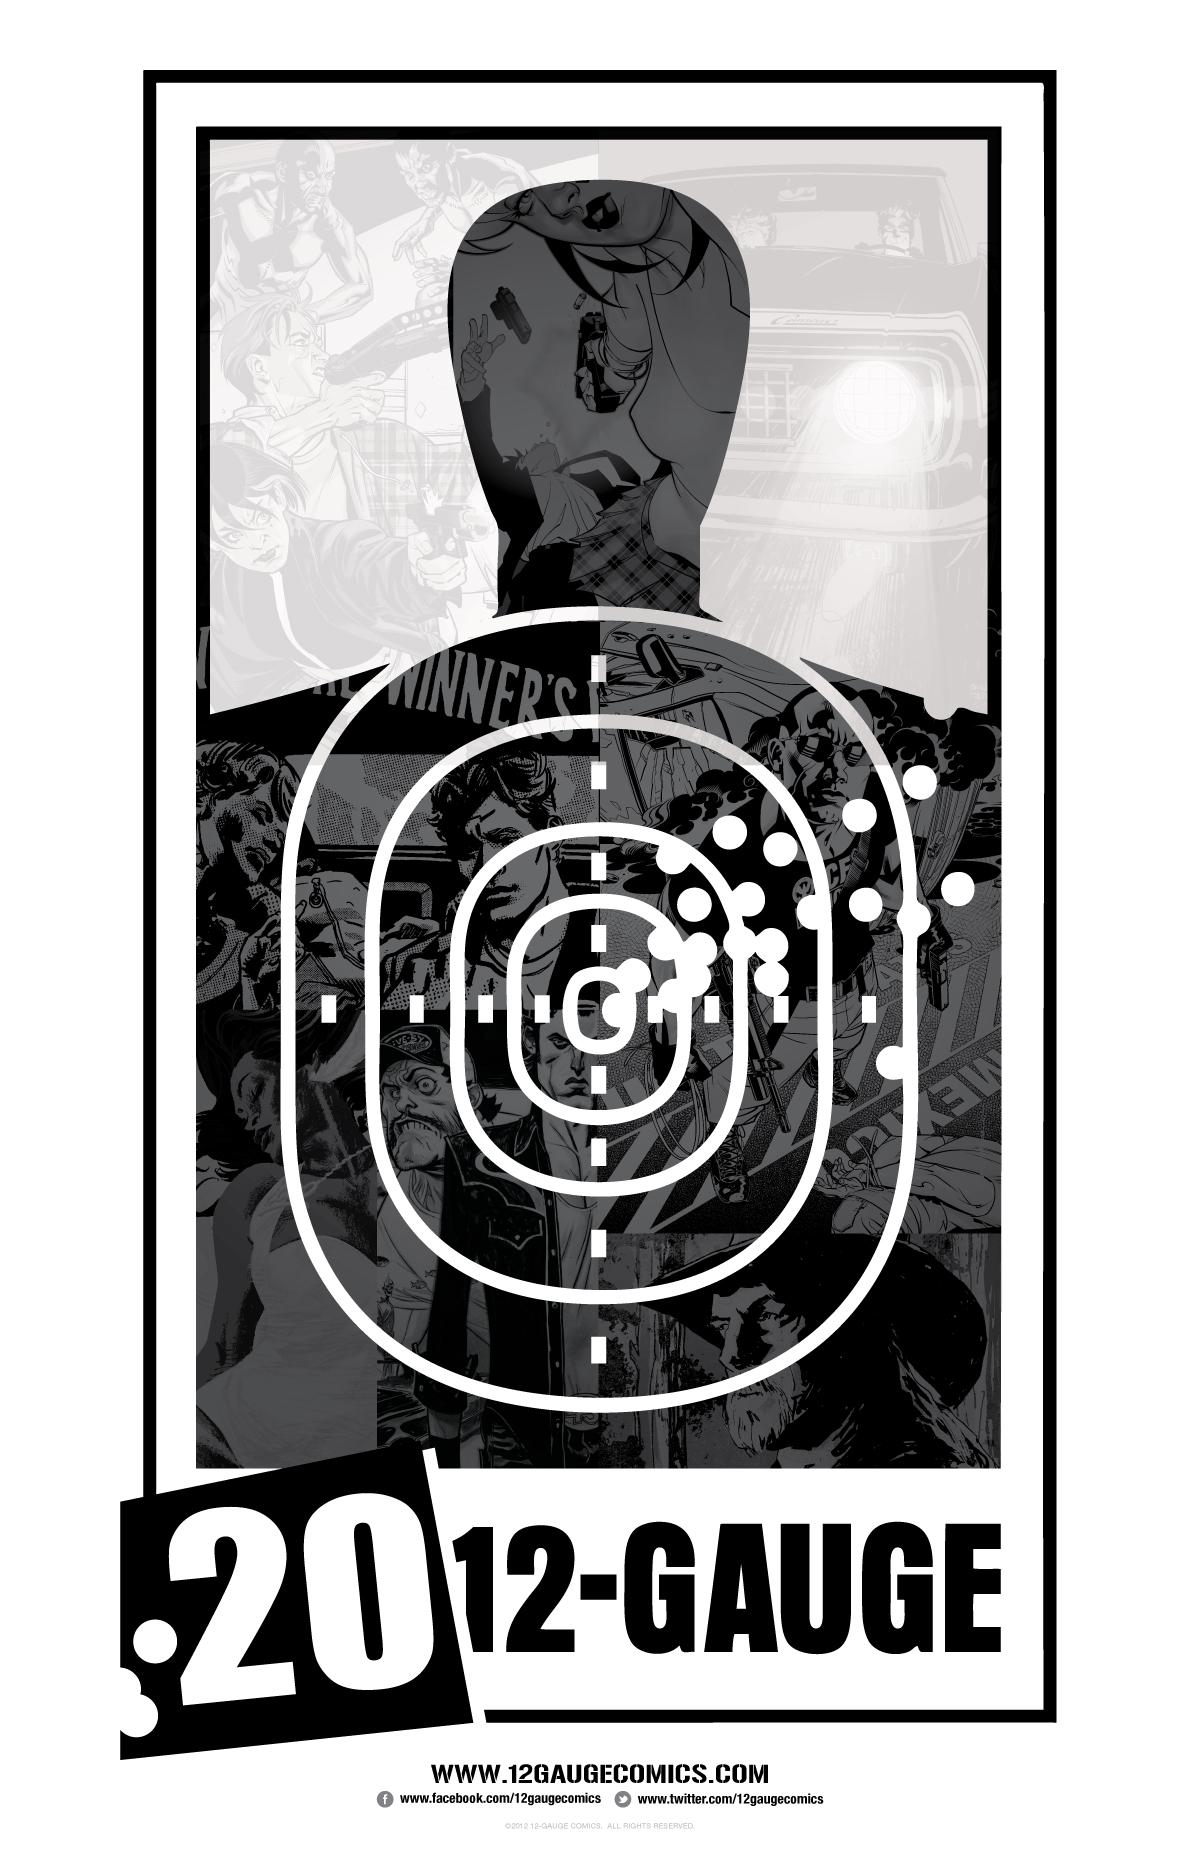 12G_Target_Poster2012.jpg